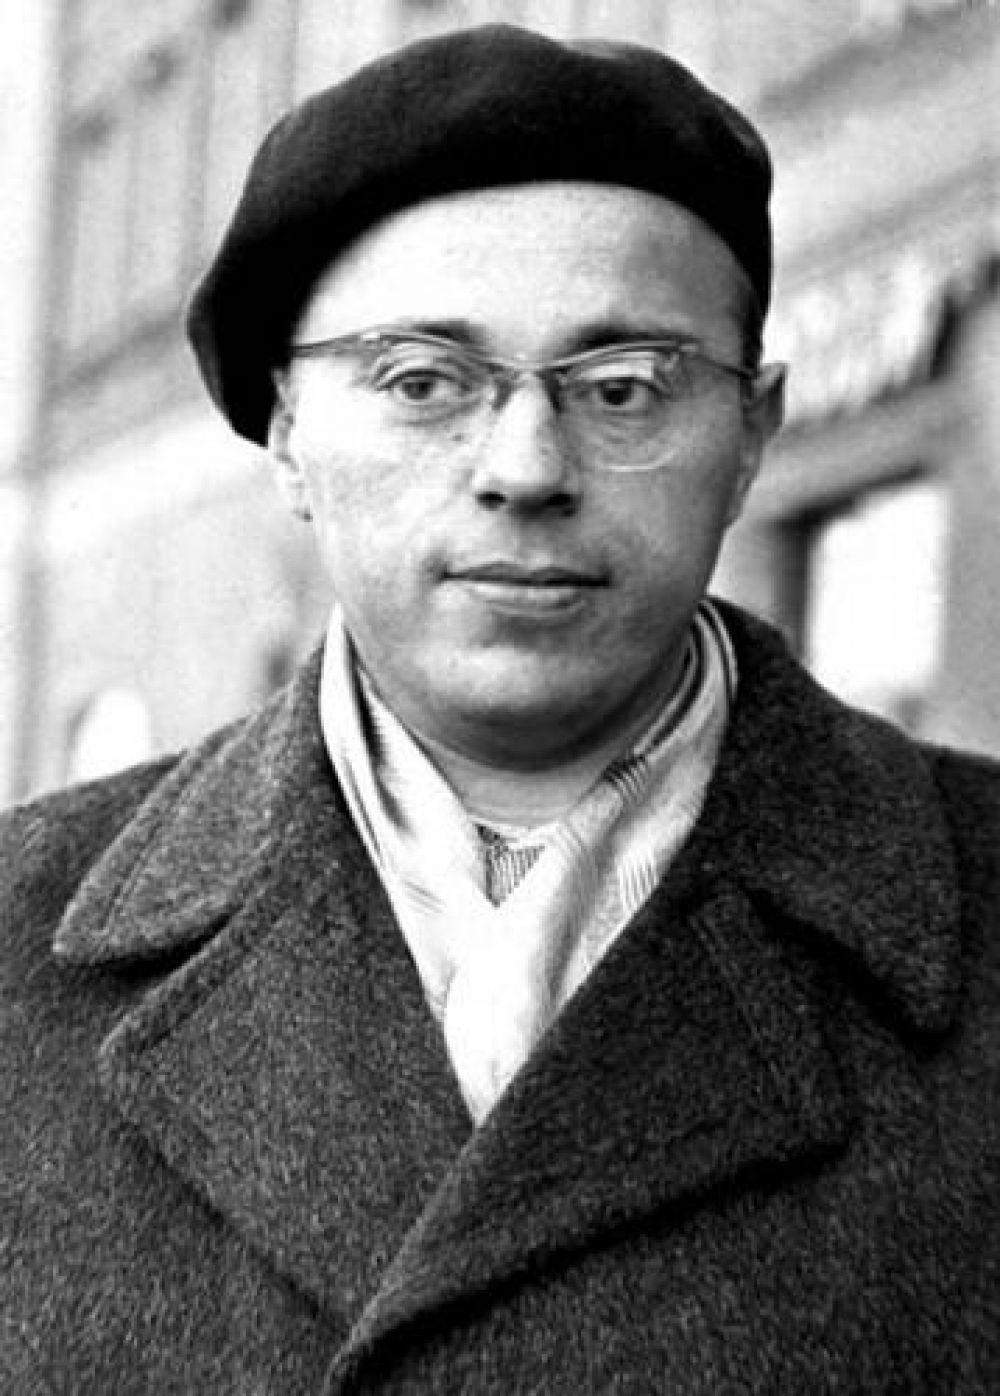 Actor Stanislav Zhdanko: biography, filmography and interesting facts 65